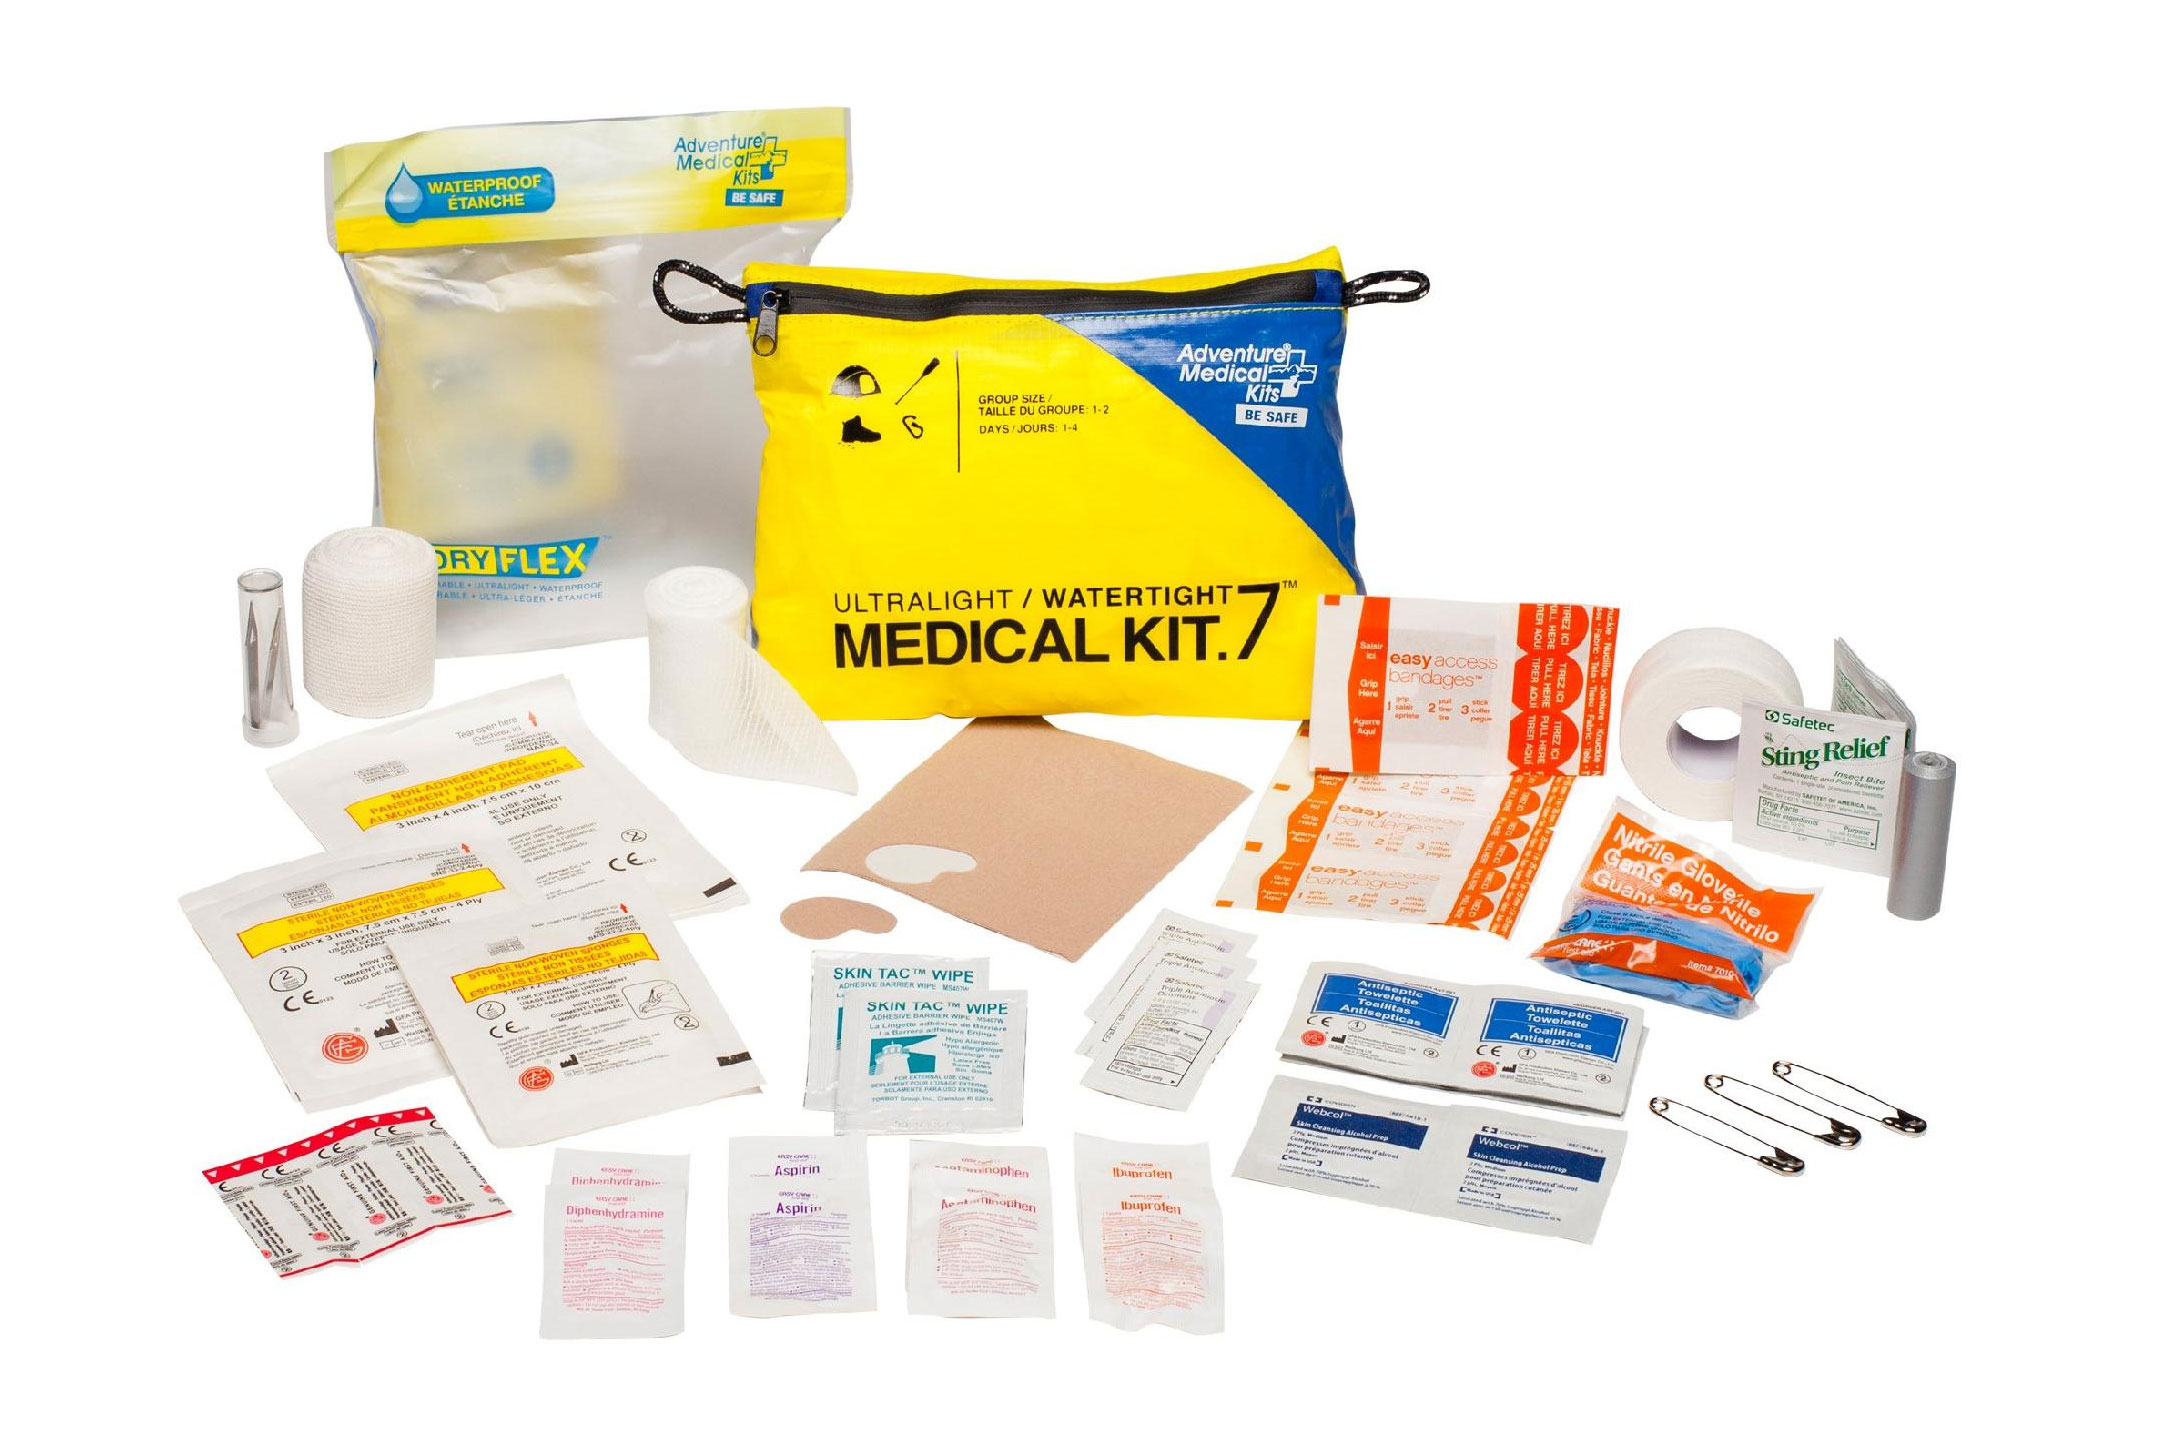 adventure medical kits ultralightwatertight .7